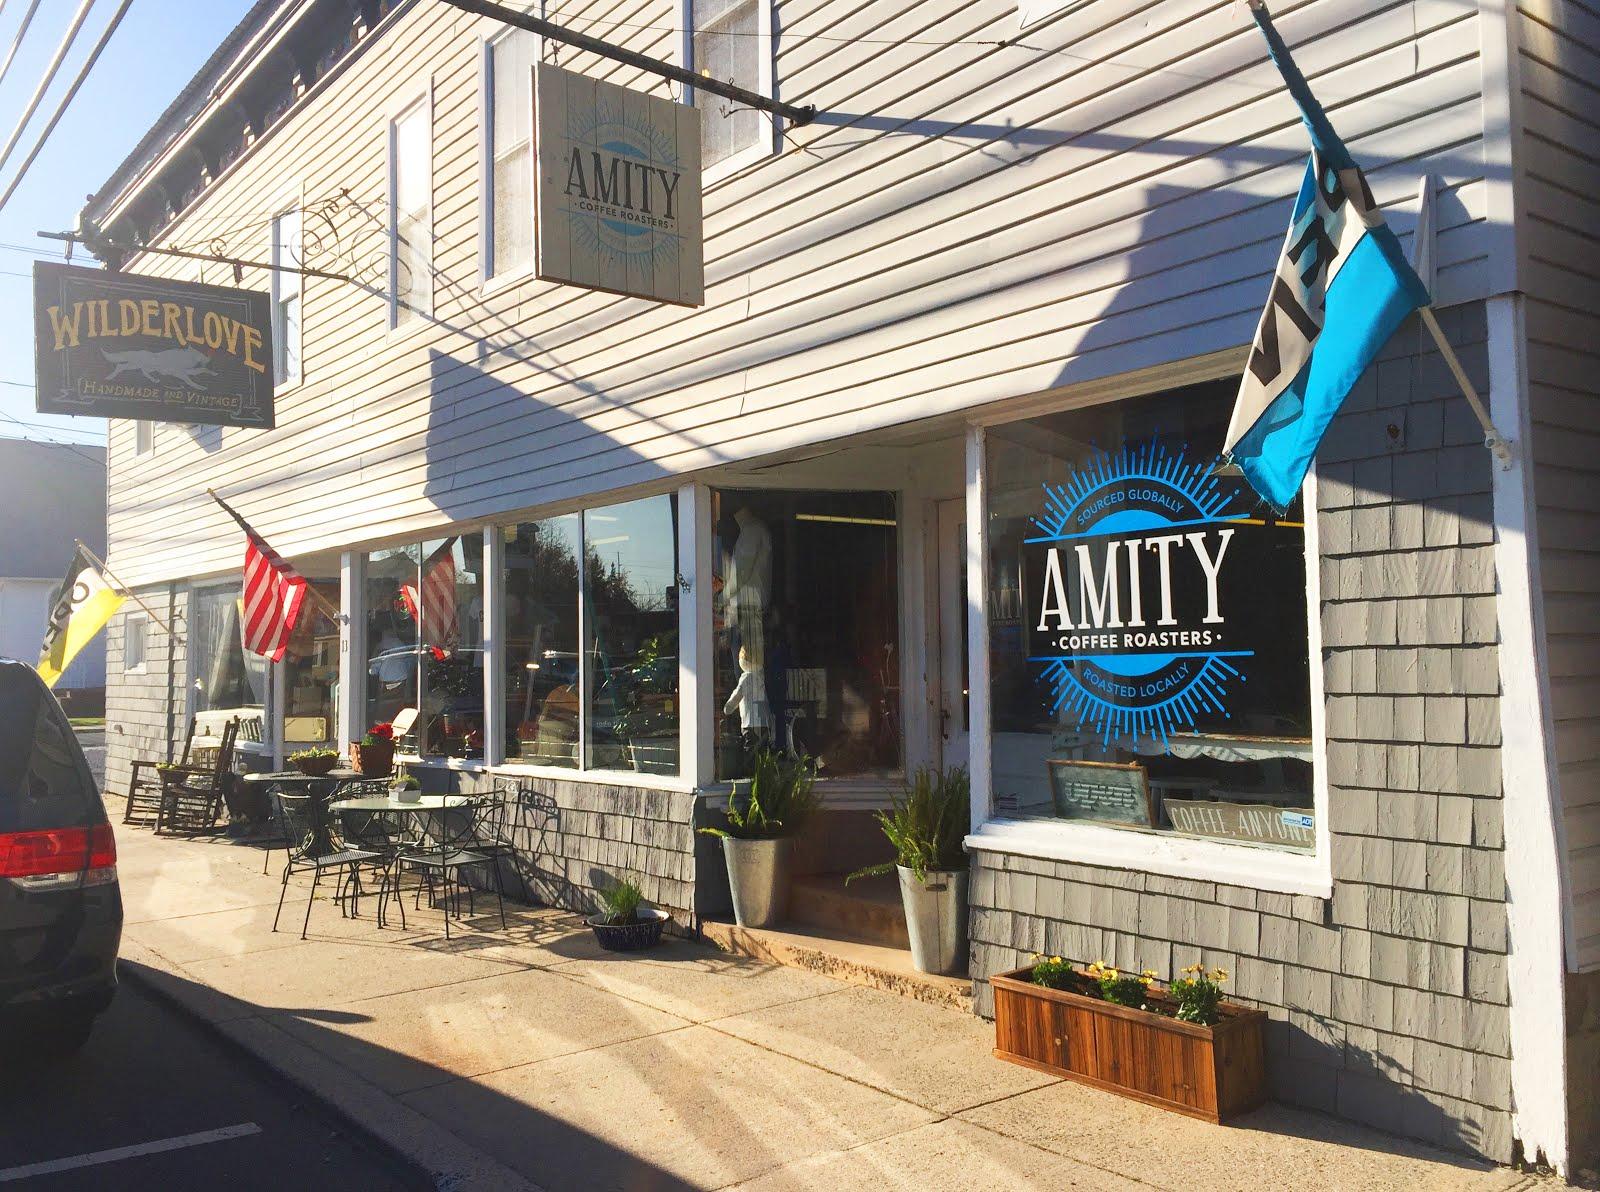 Amity Coffee Roasters